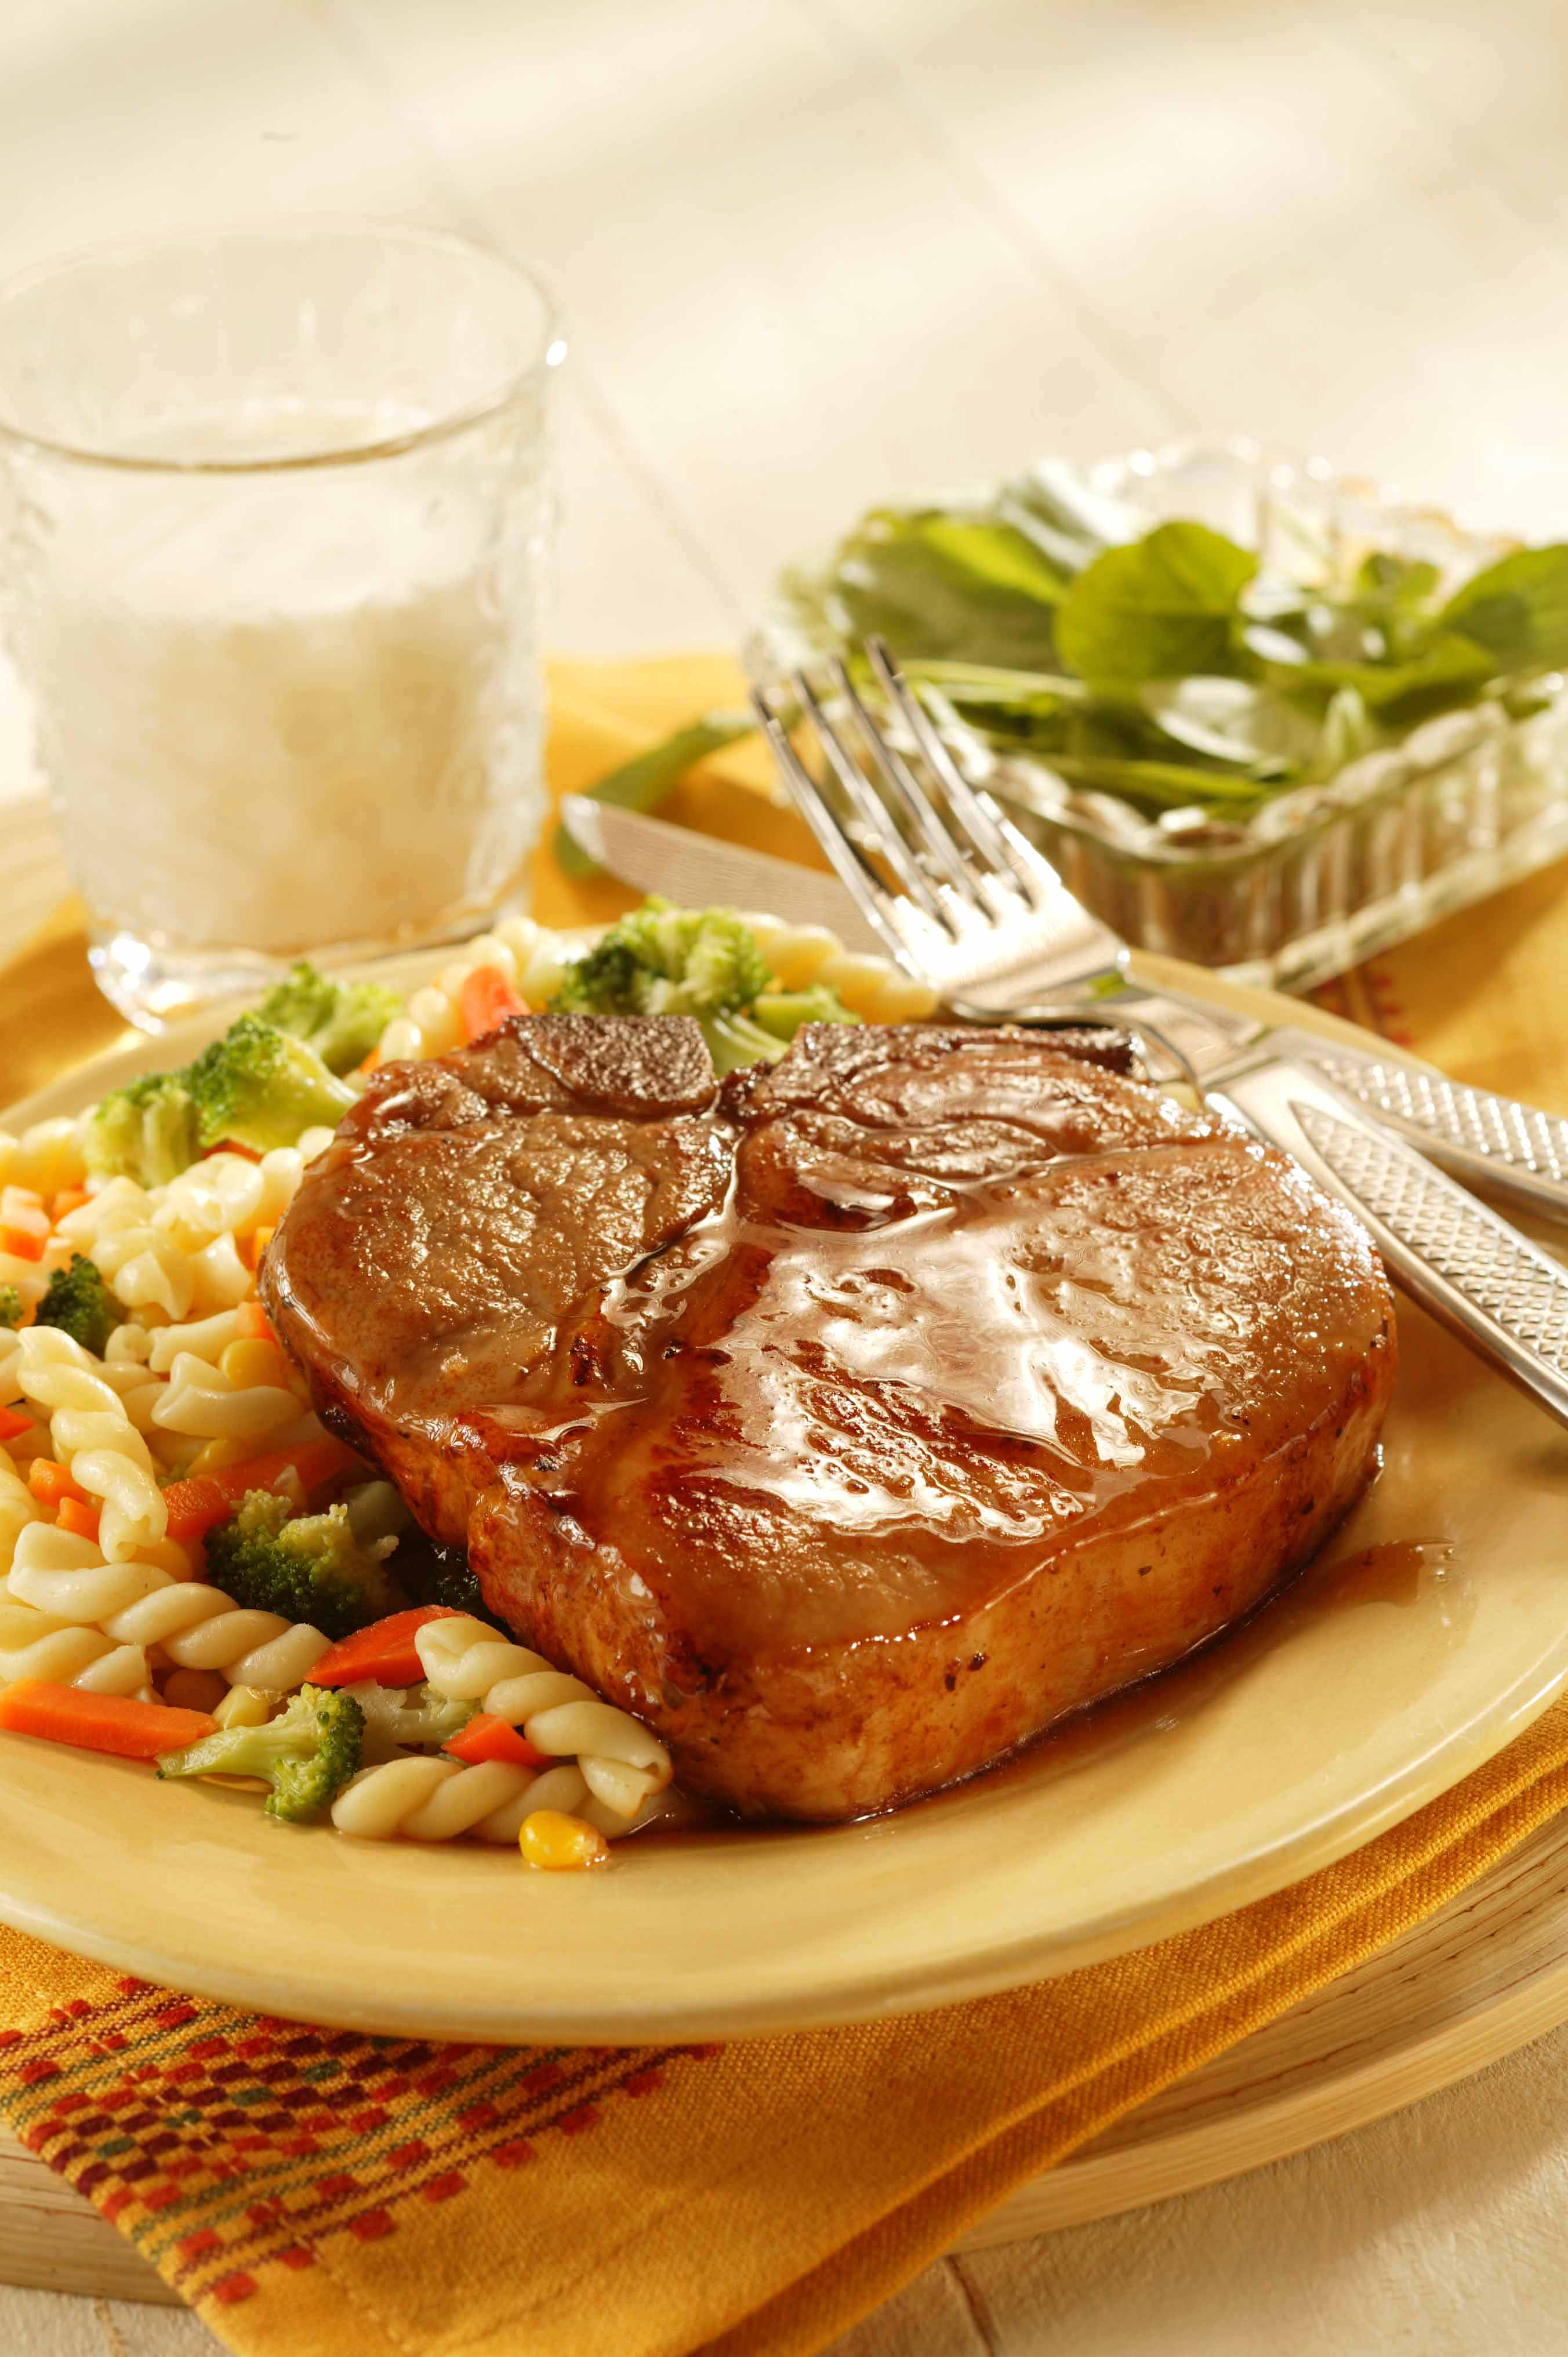 Different Ways To Cook Pork Chops - Honey glazed pork chops